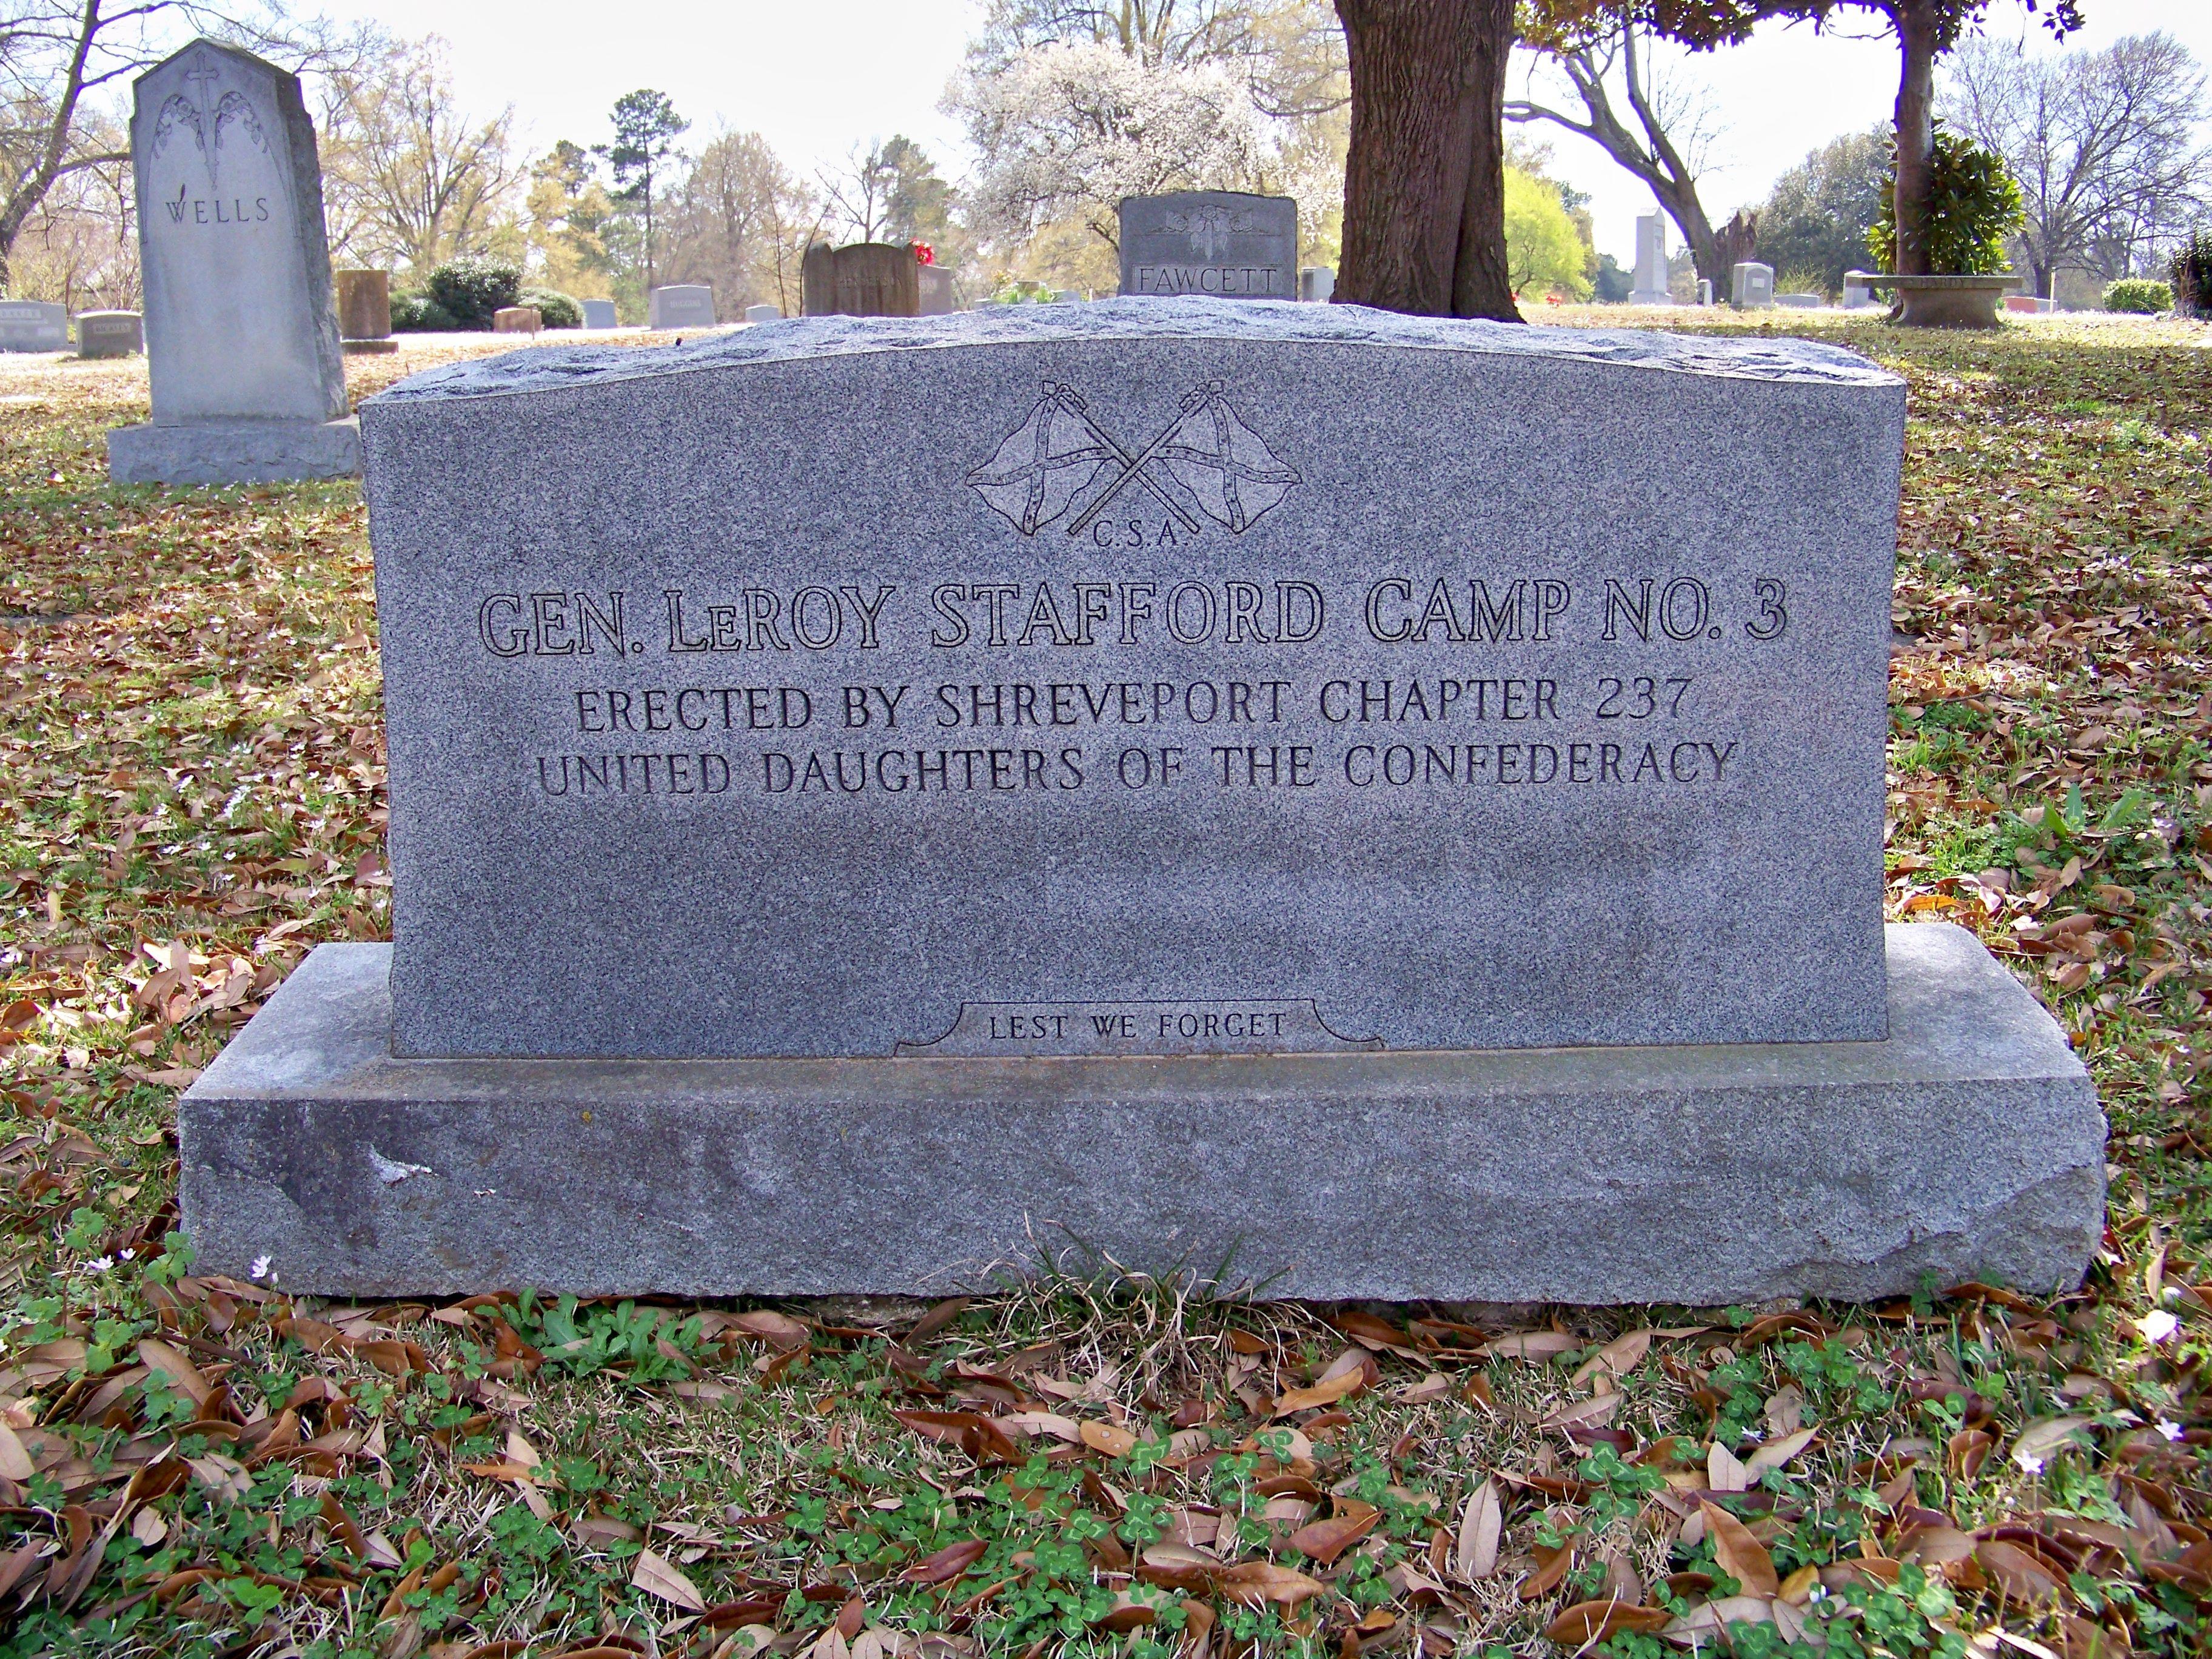 445c735637460d66d9193c8ba246cc58 - Southern Memorial Gardens Cemetery Baton Rouge